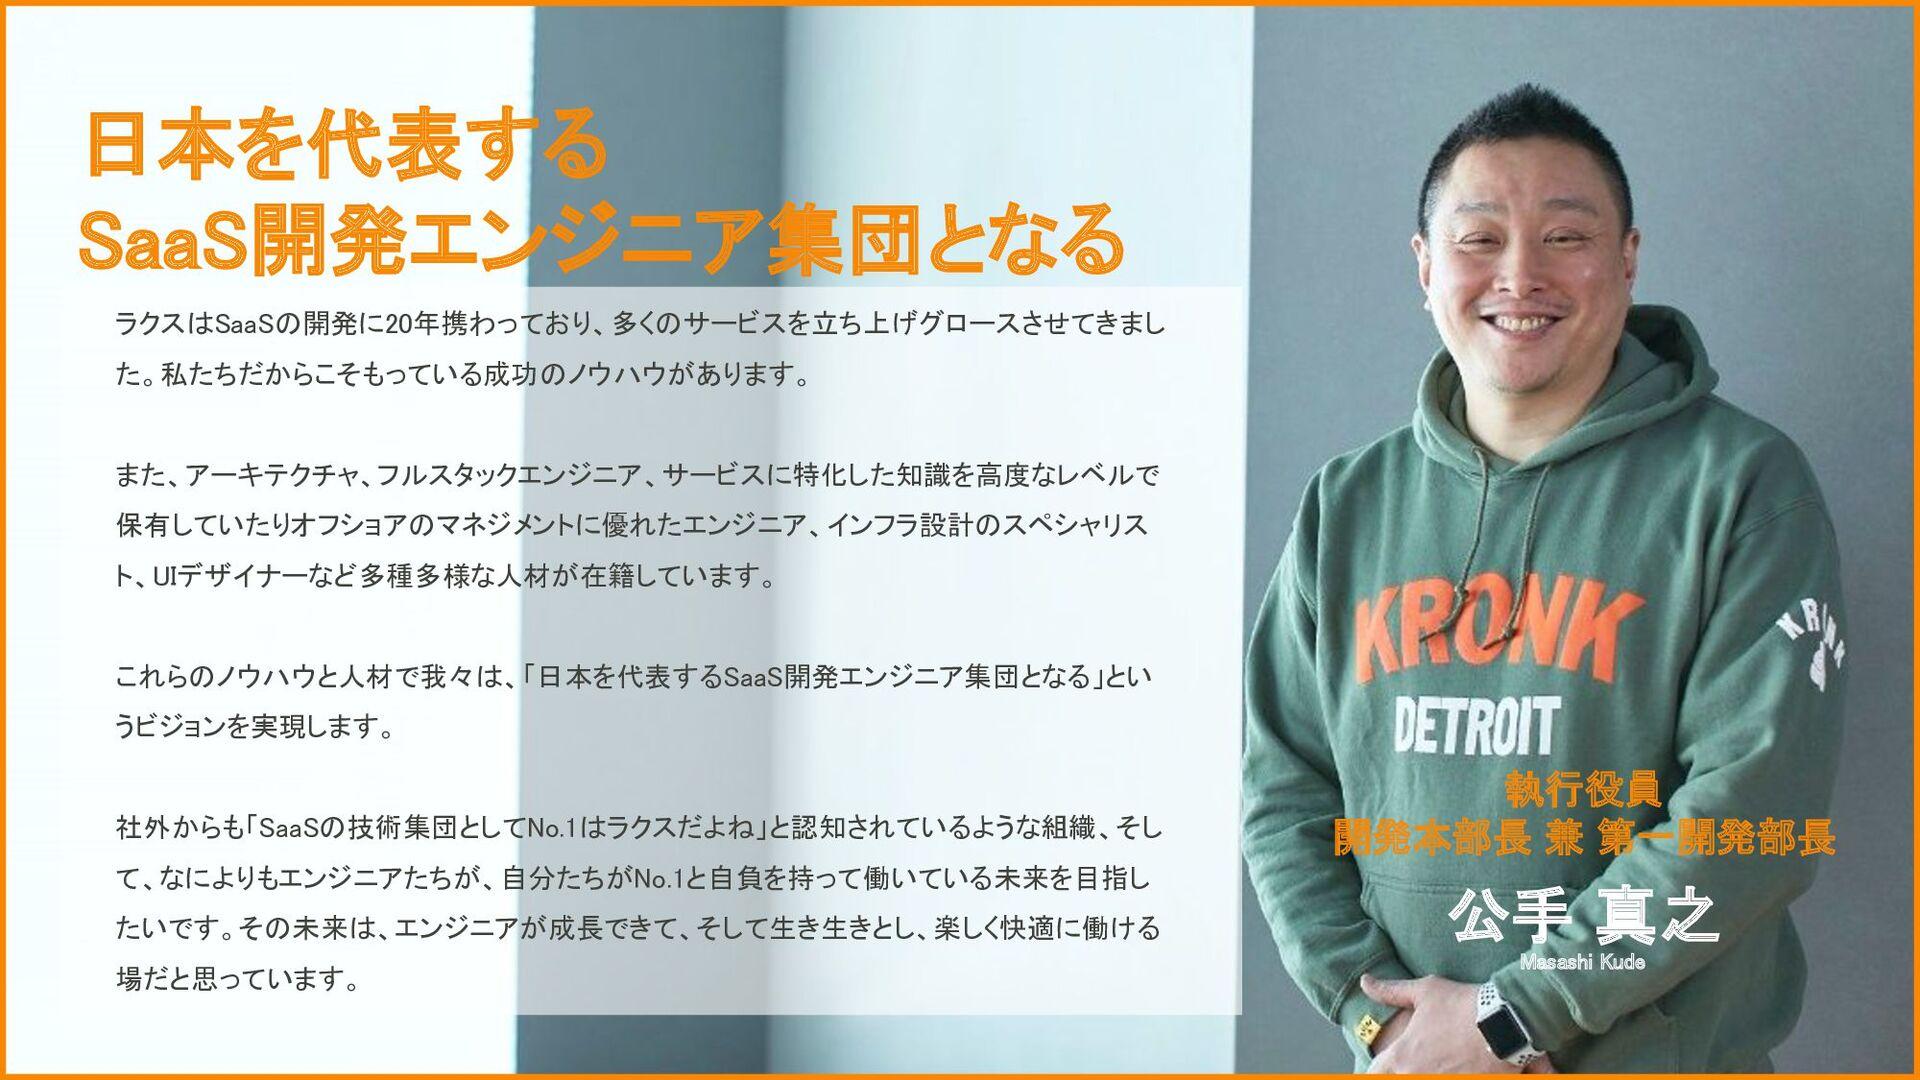 公手 真之 Masashi Kude 執行役員 開発本部長 兼 第一開発部長 日本を代表する ...